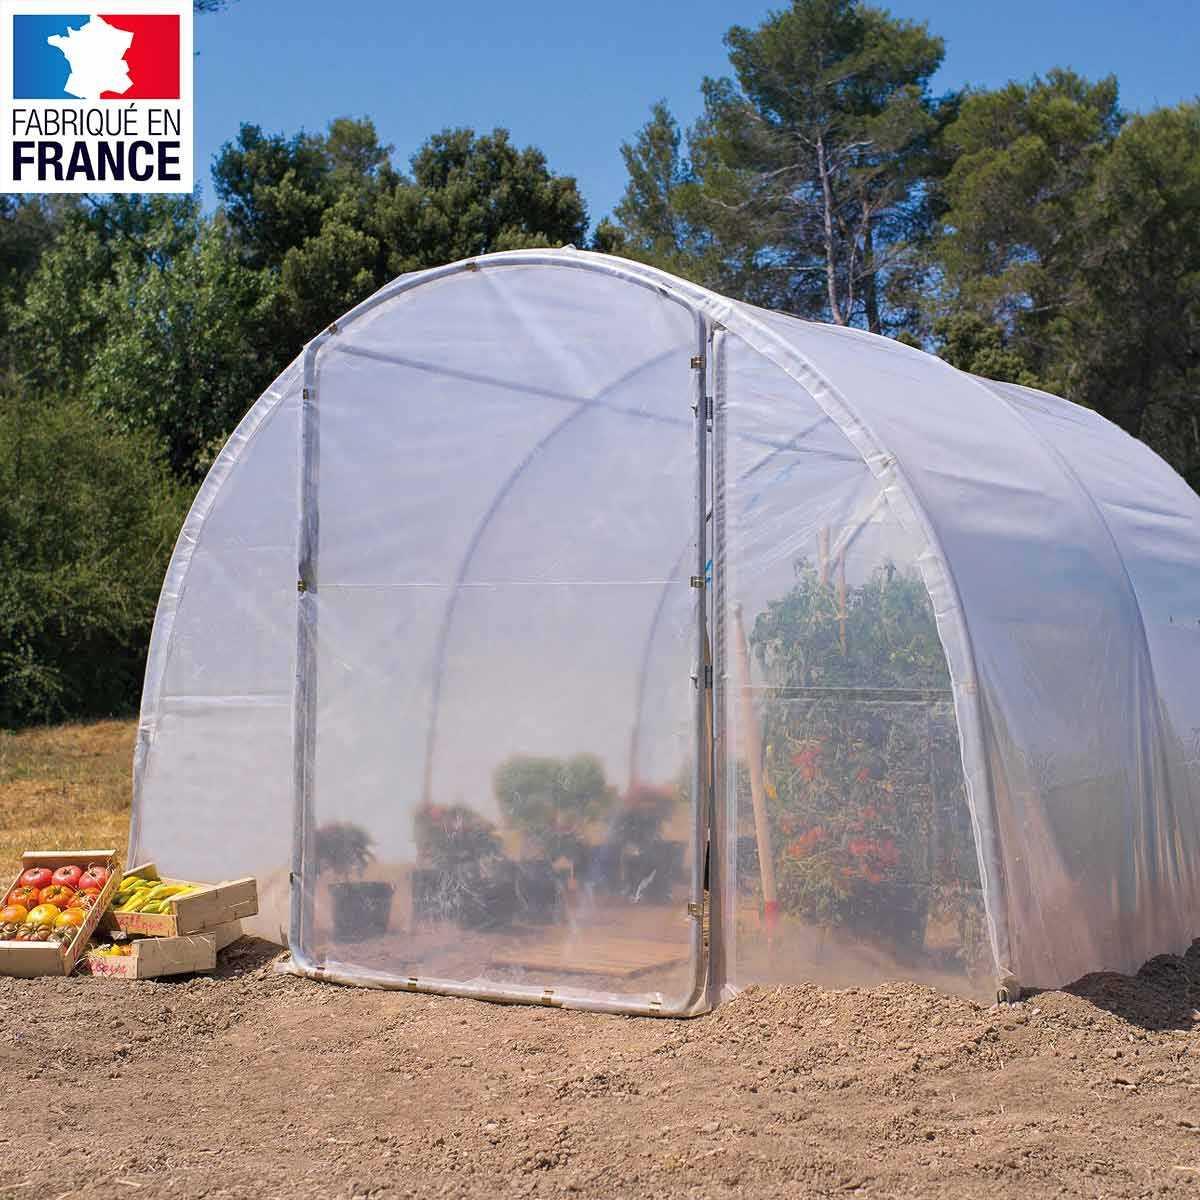 serre de jardin tunnel richel 3m x 3m 9m2 vente au meilleur prix jardins animes